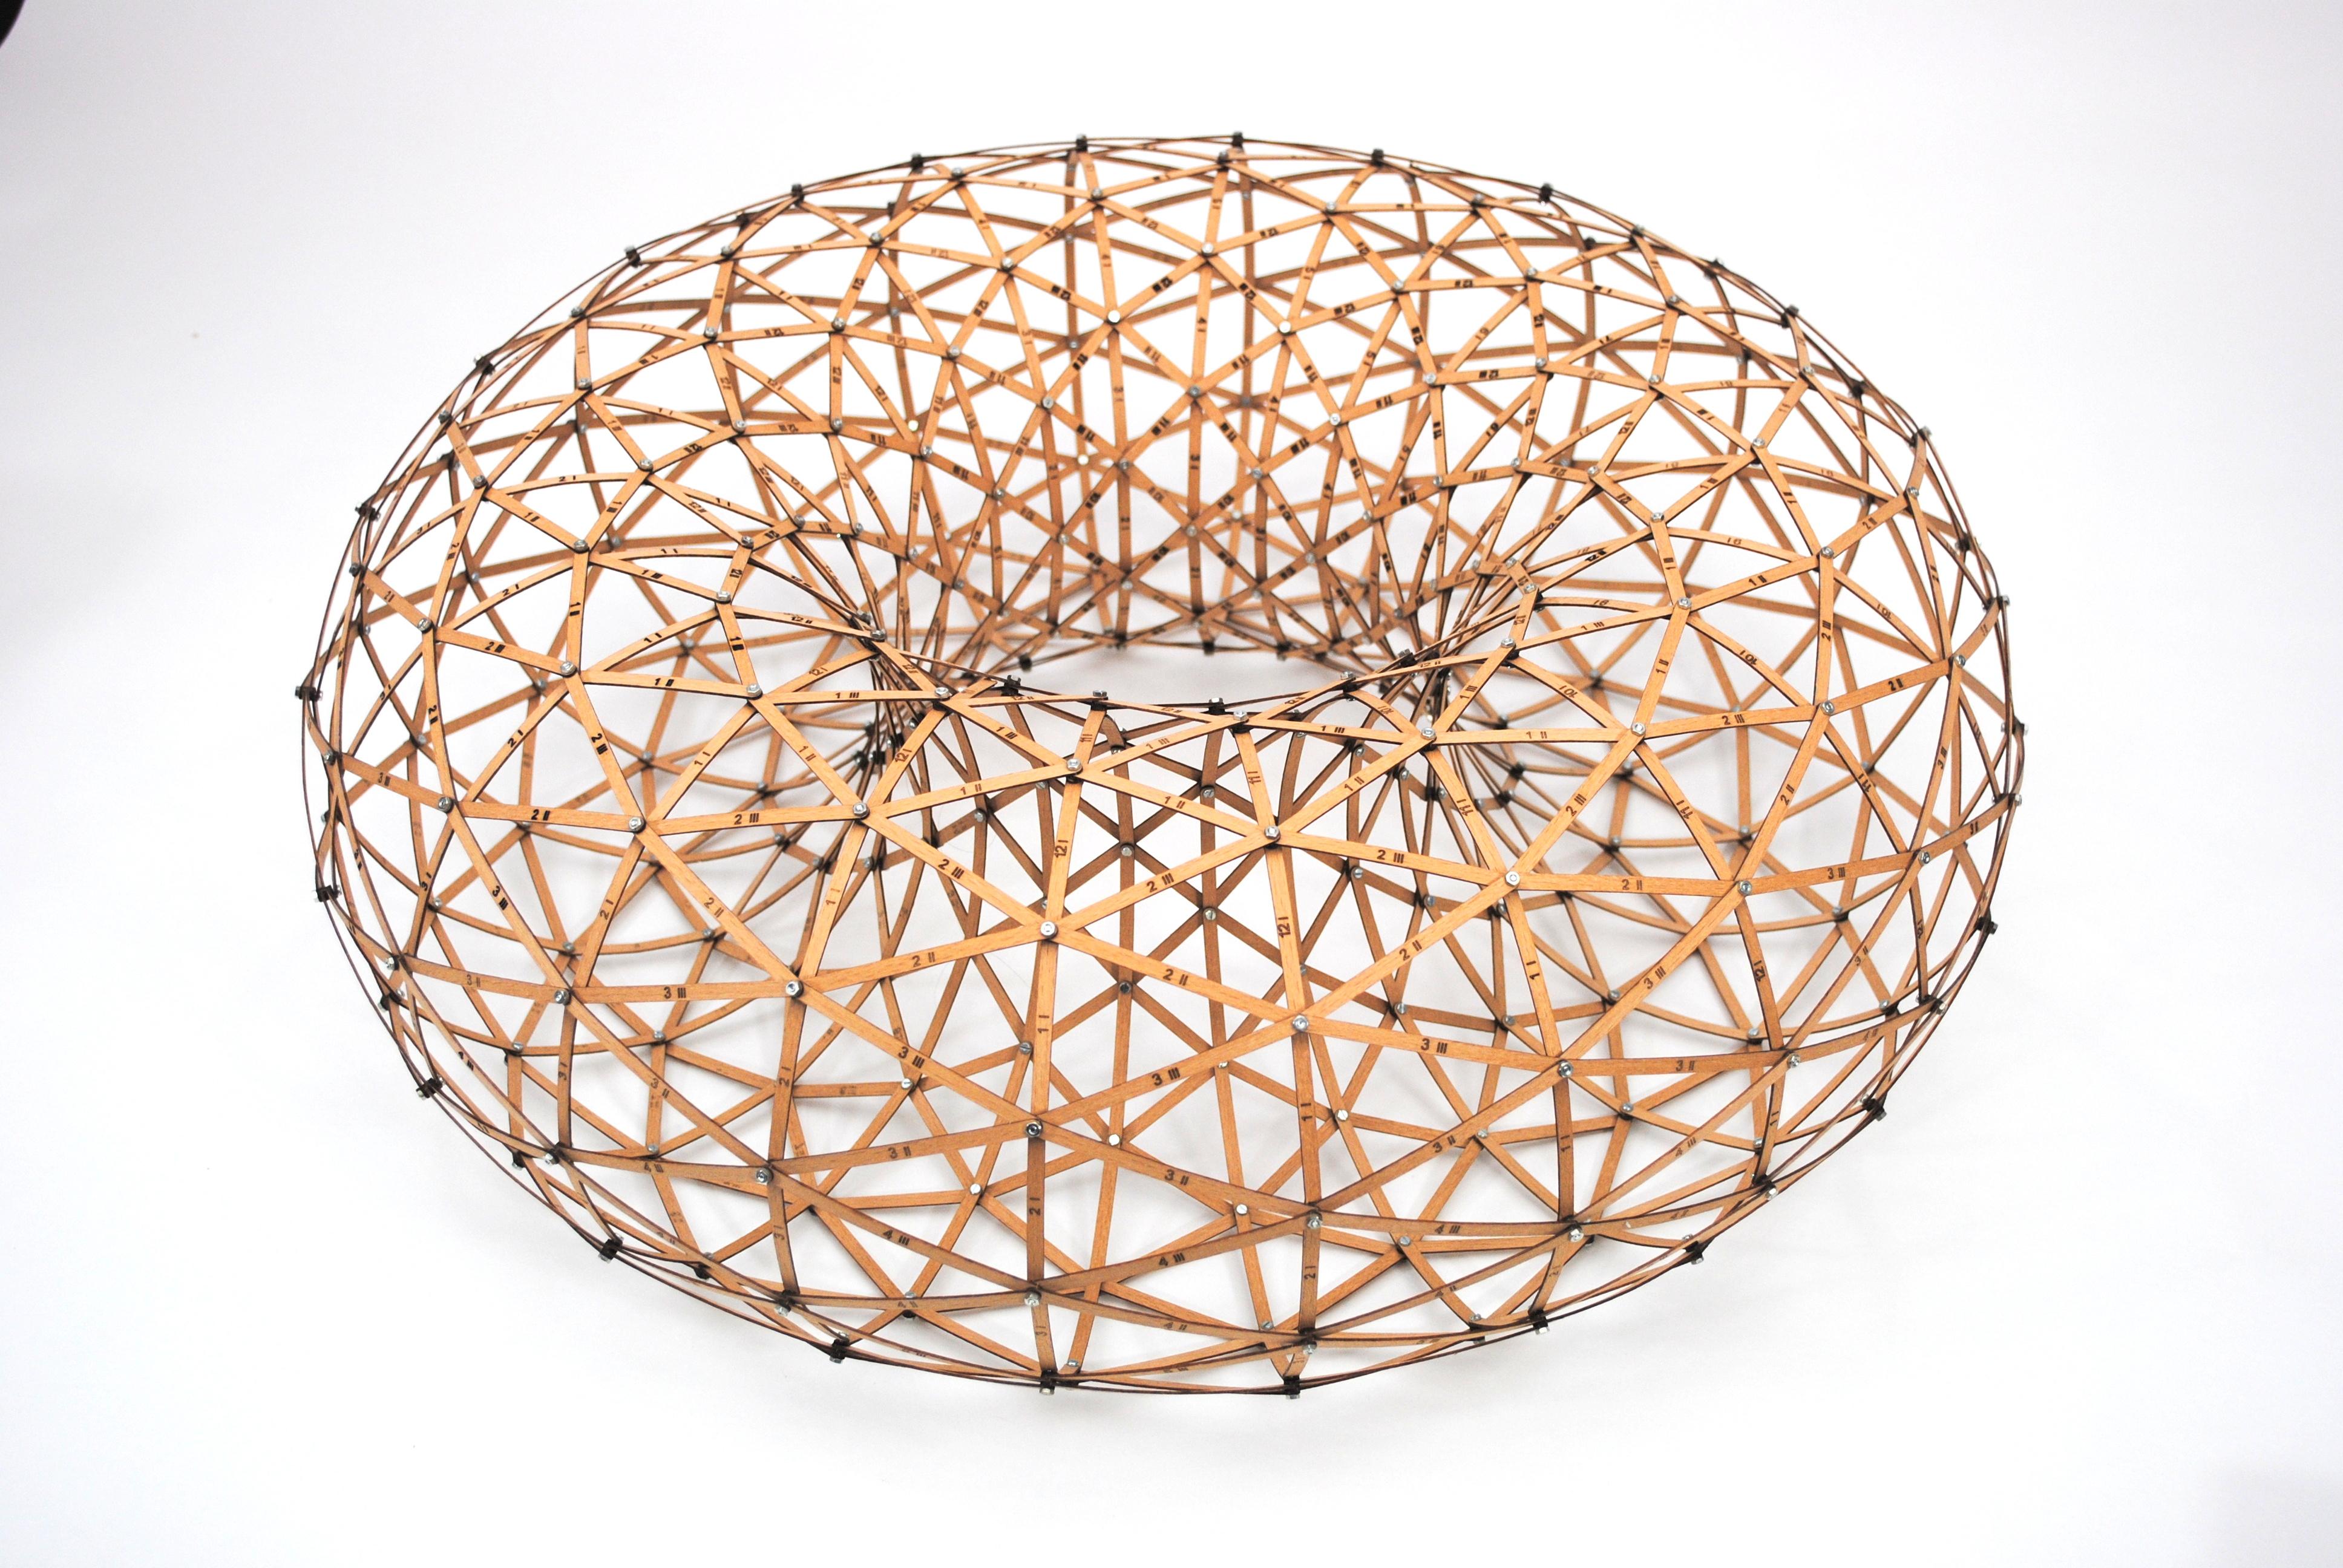 Torus - Wooden Construction Kit - ScientificsOnline com